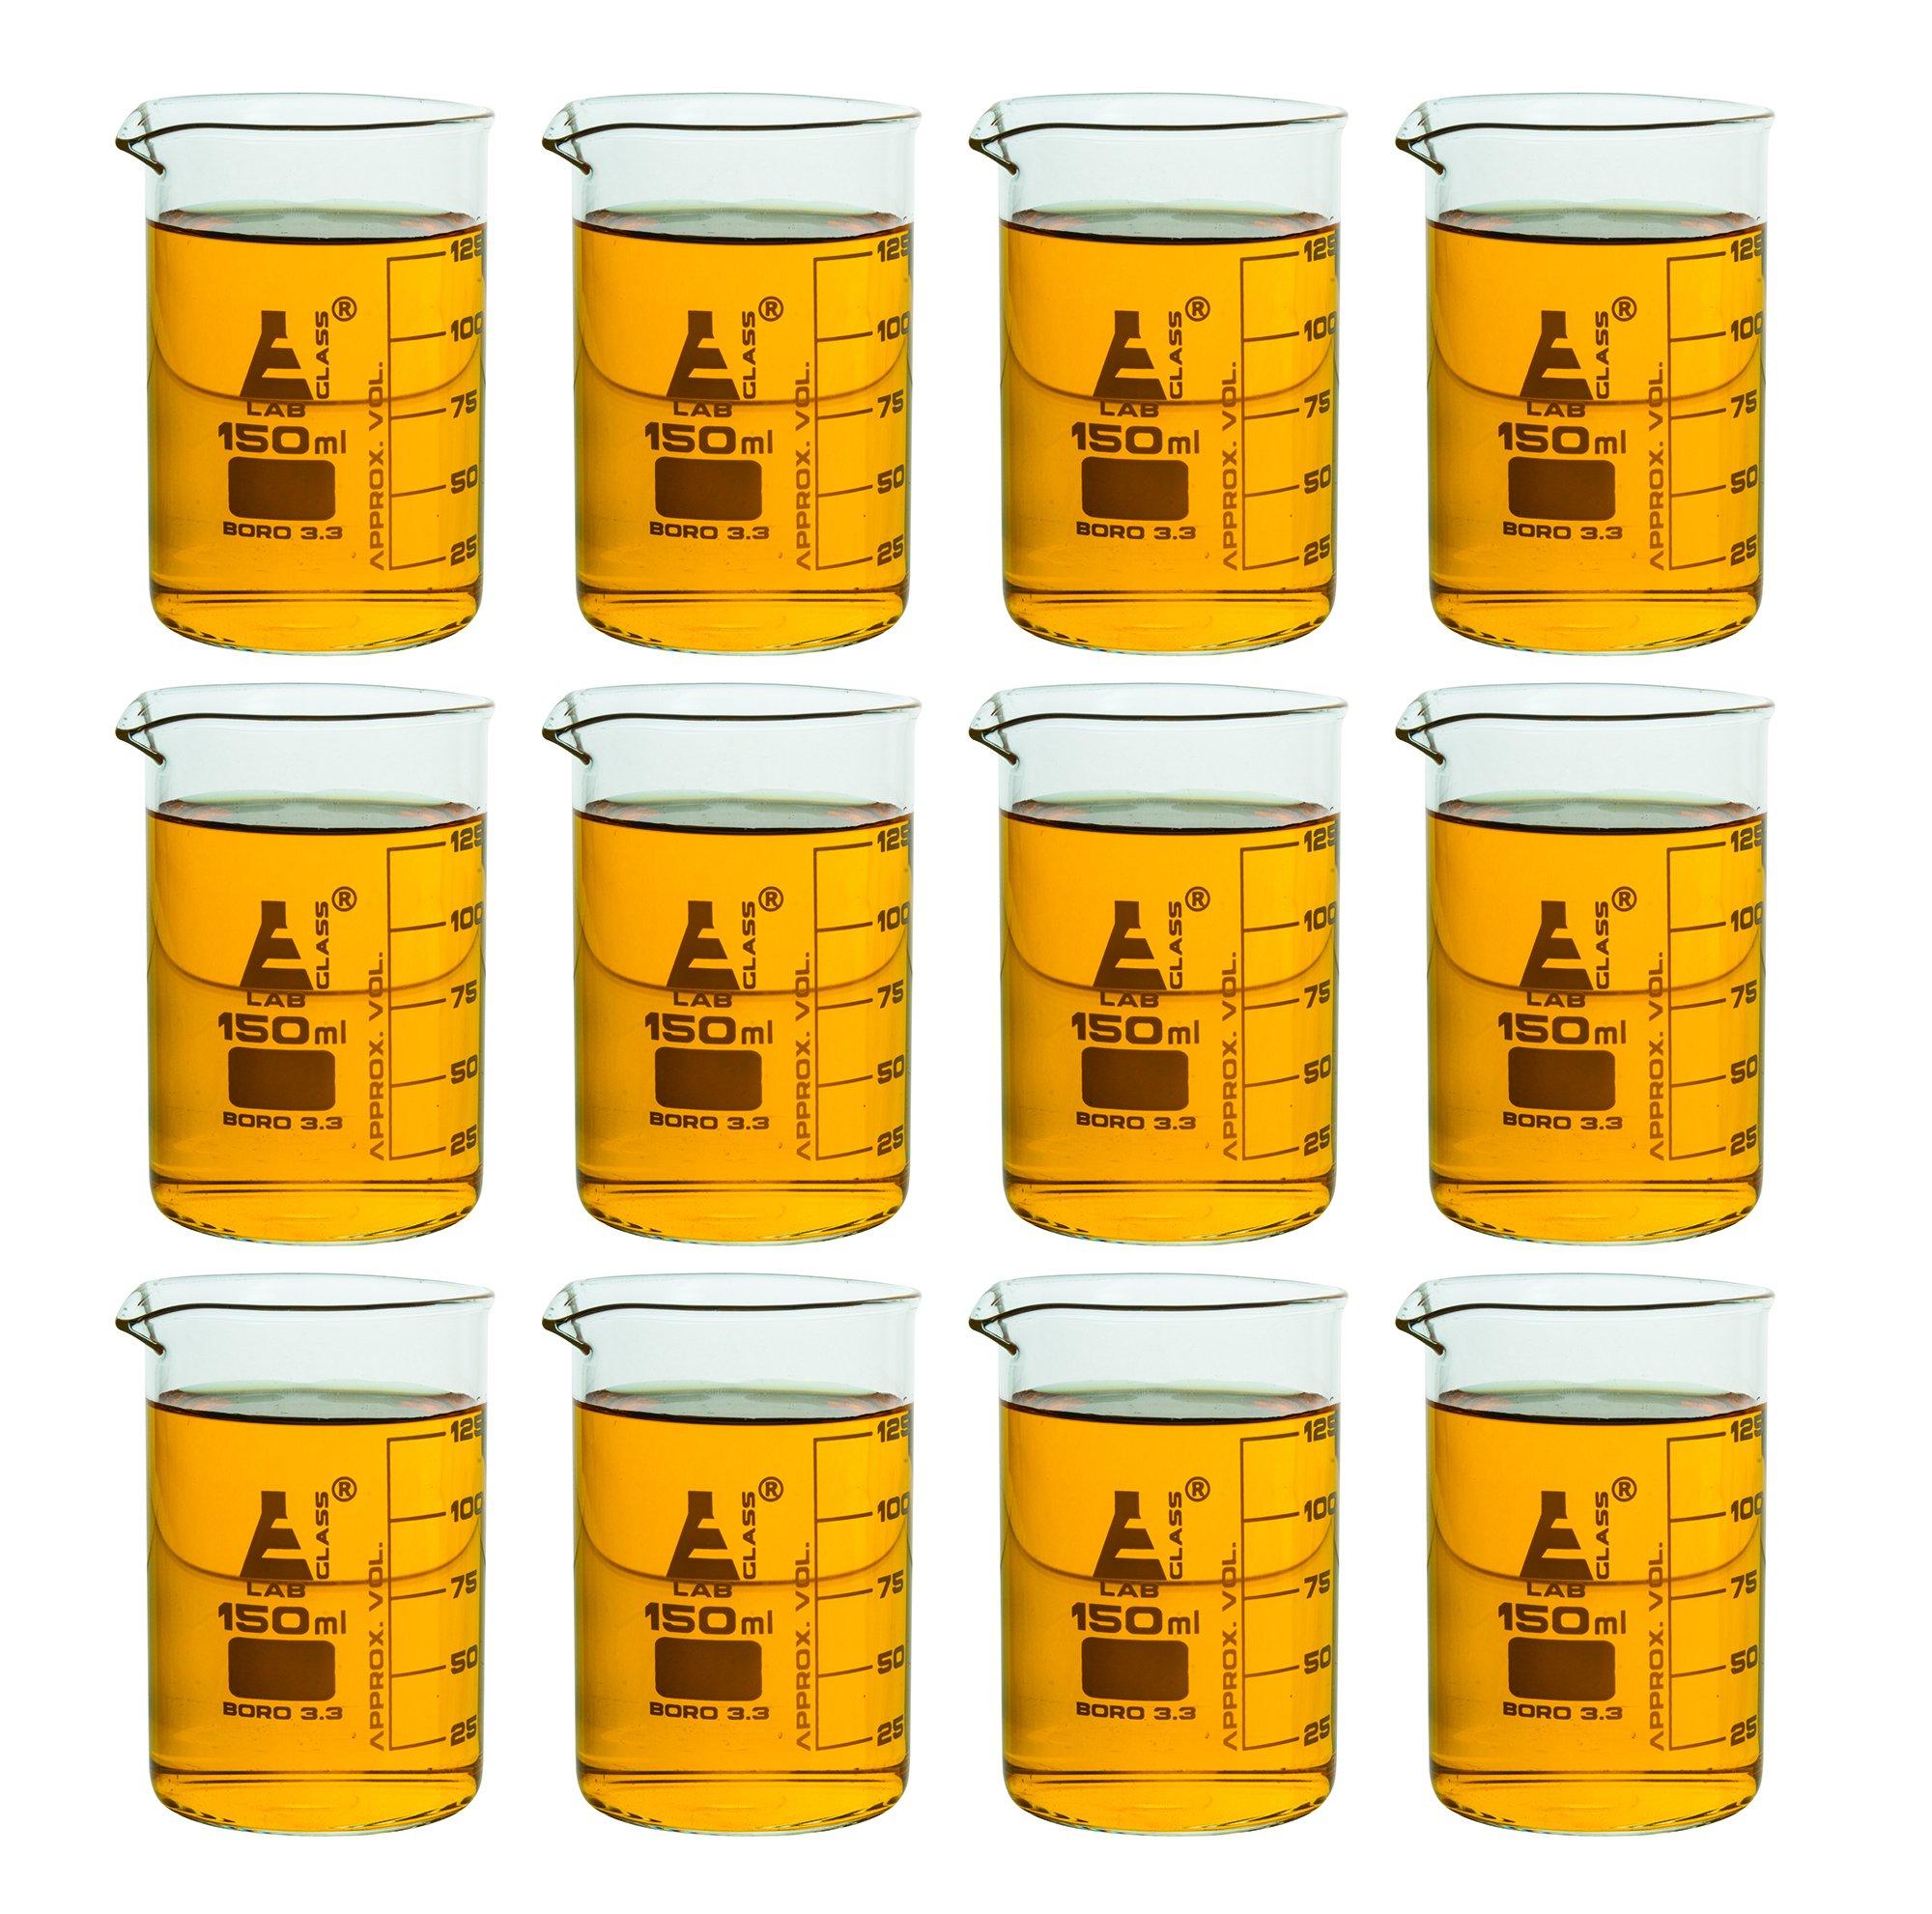 Eisco Labs Beaker - 150mL, Borosilicate Glass, 125mL graduation Low form - Pack of 12